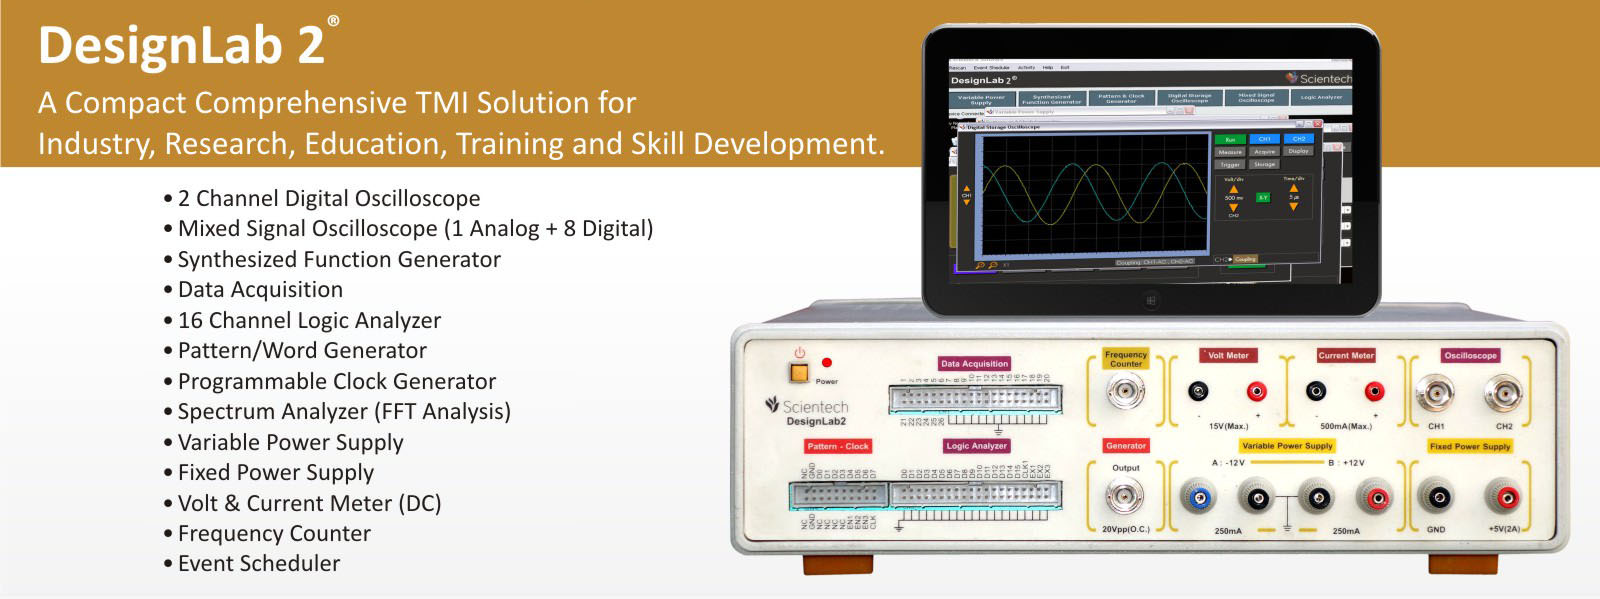 DesignLab 2, 12 in 1 Instrument